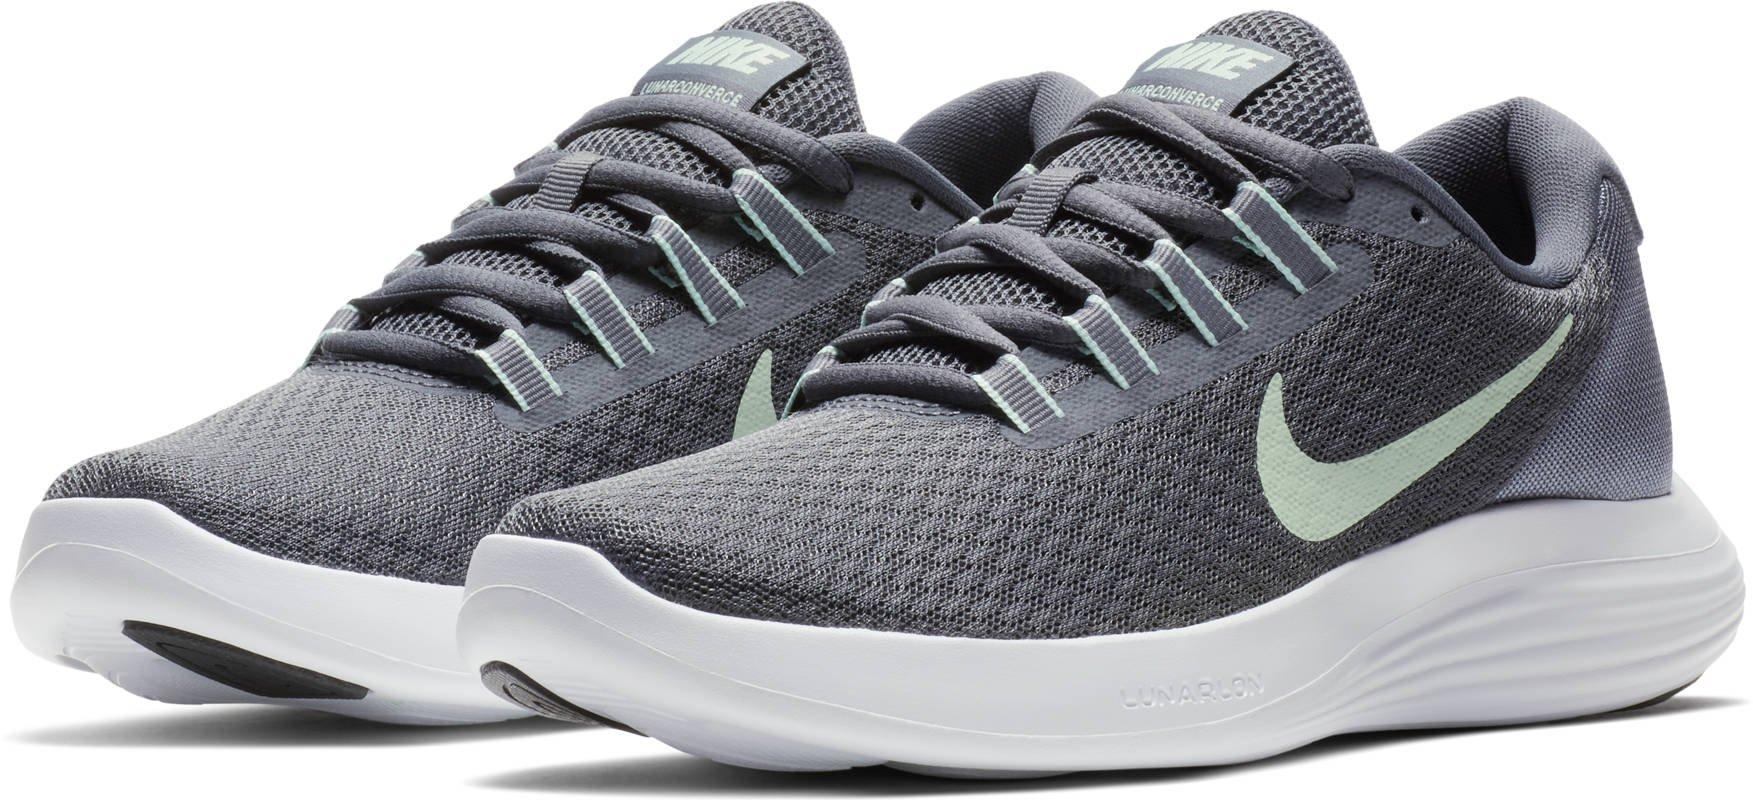 331da0731428ba Galleon - NIKE Womens Lunarconverge Dark Grey/Fresh Mint-Cool Grey-White -  Footwear||Women's Footwear||Women's Running